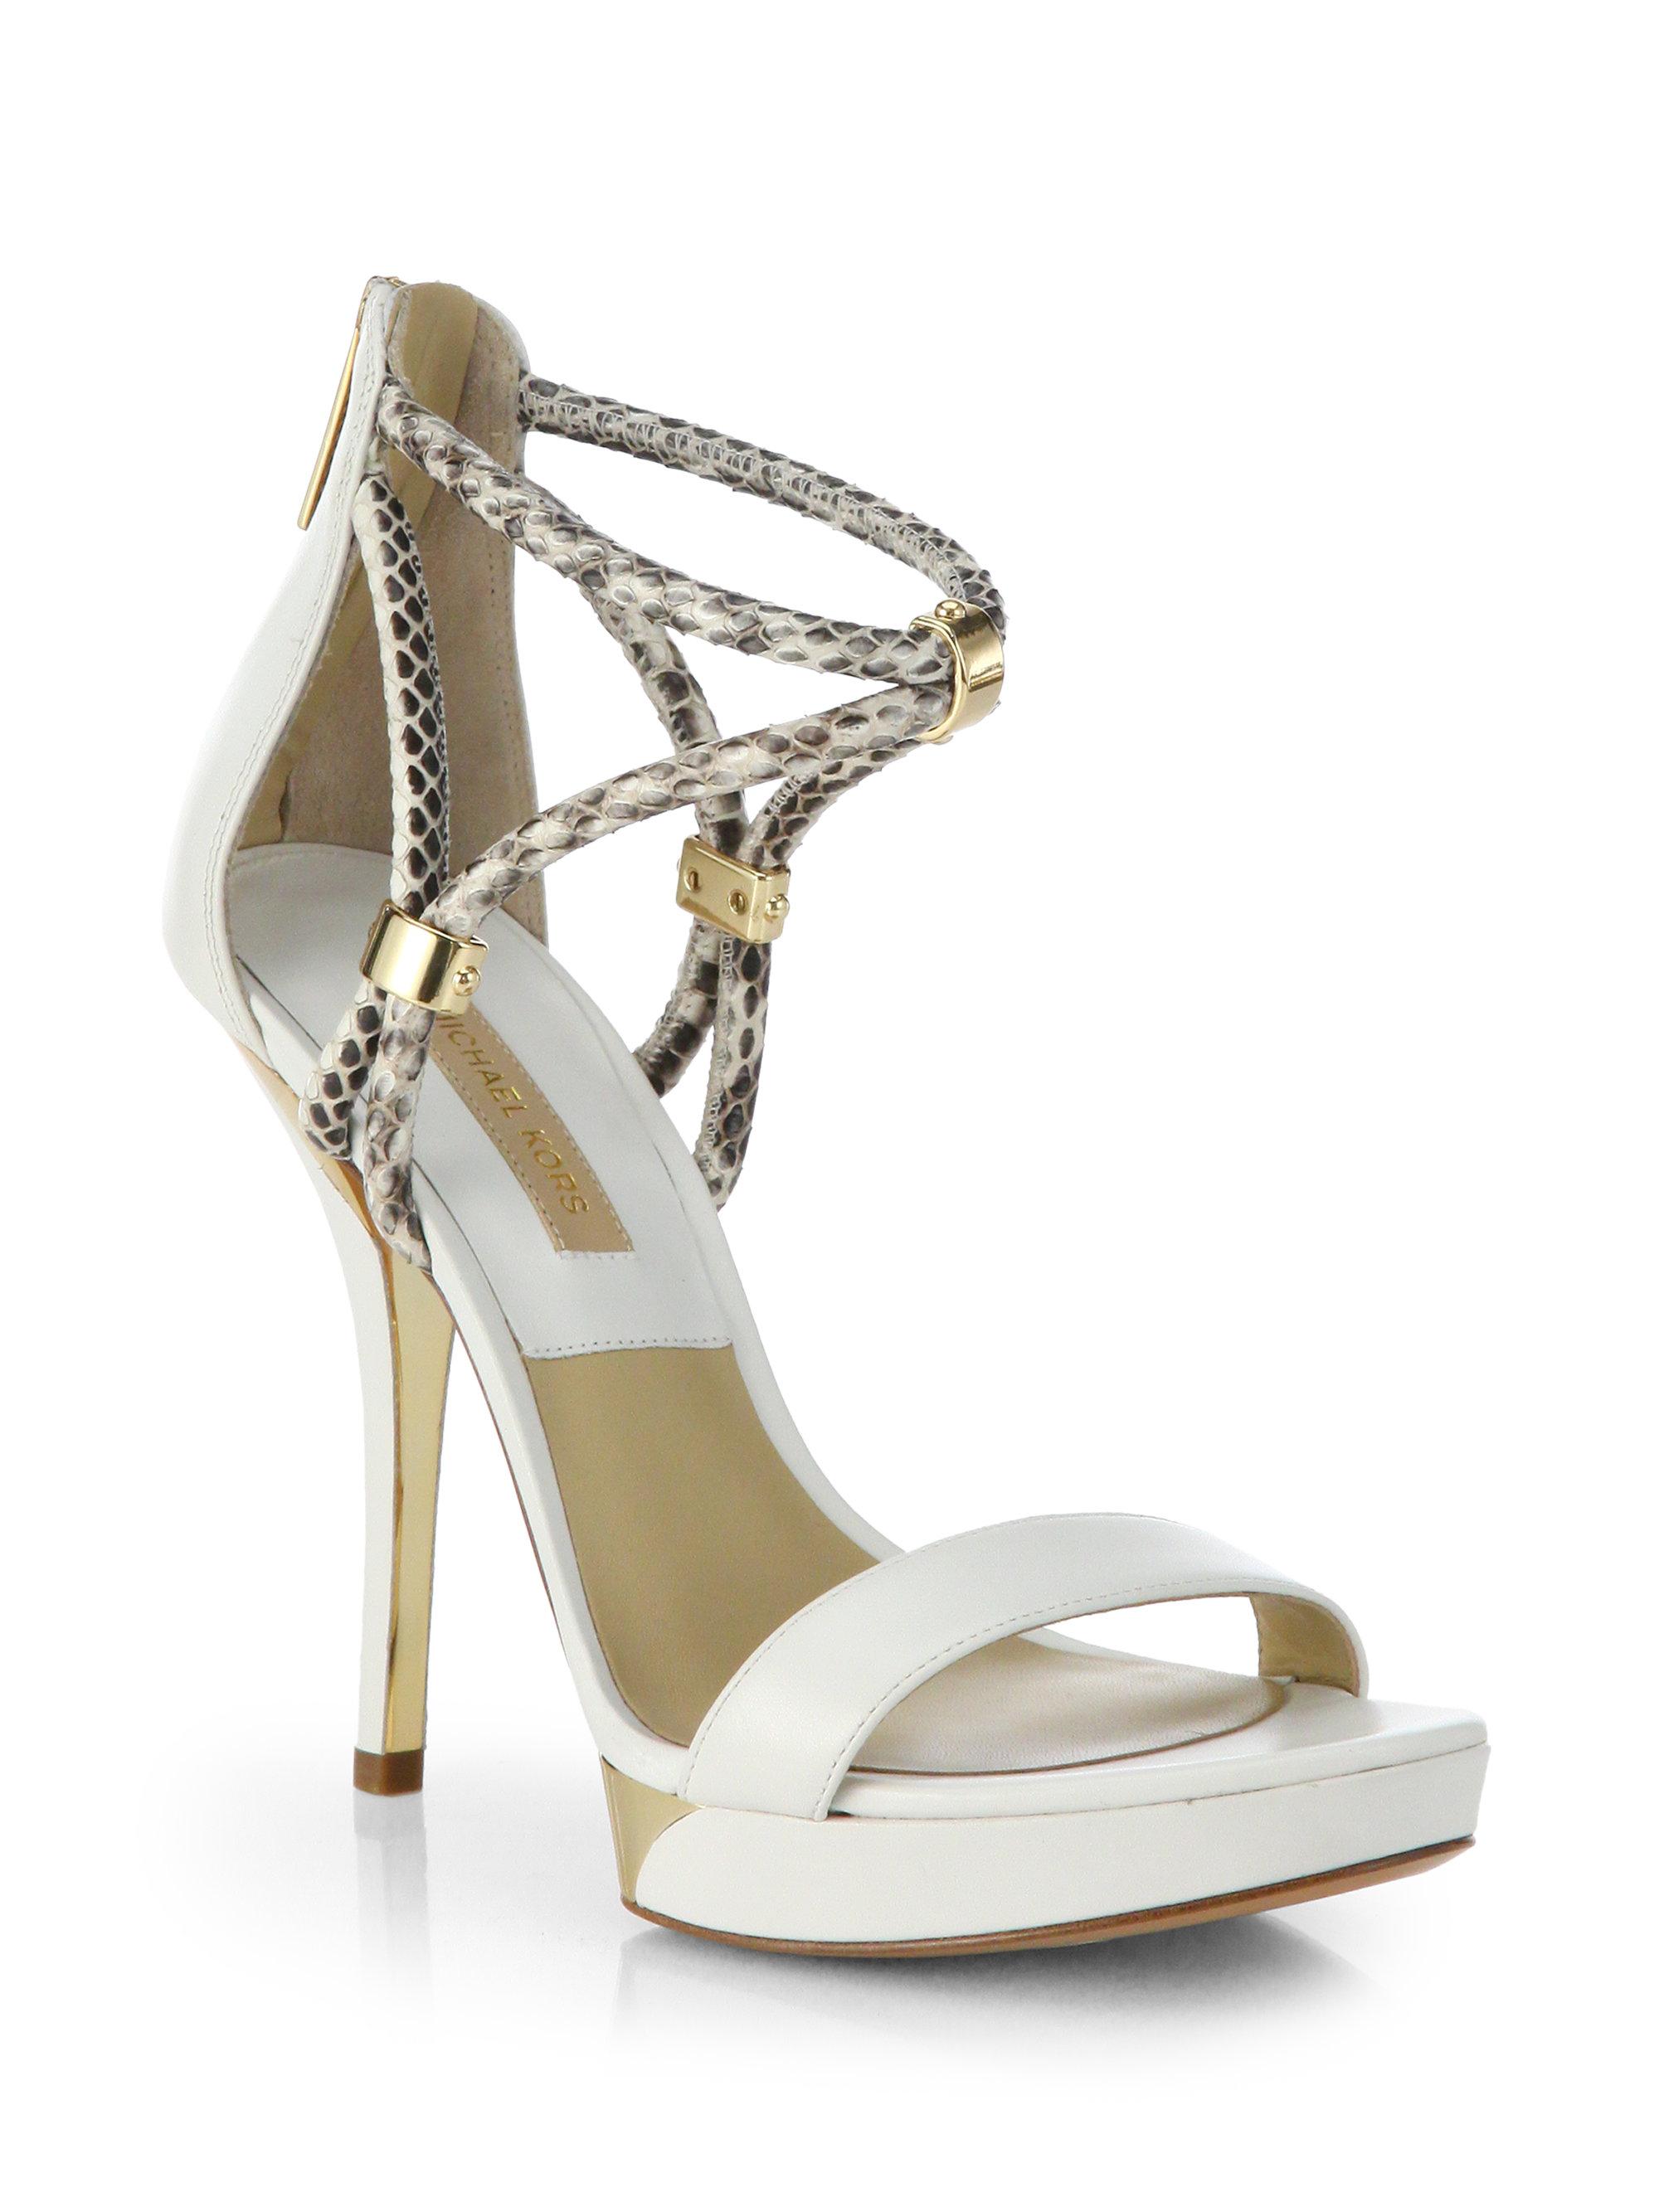 de61382a5b1 Lyst - Michael Kors Fariha Leather Snakeskin Platform Sandals in White